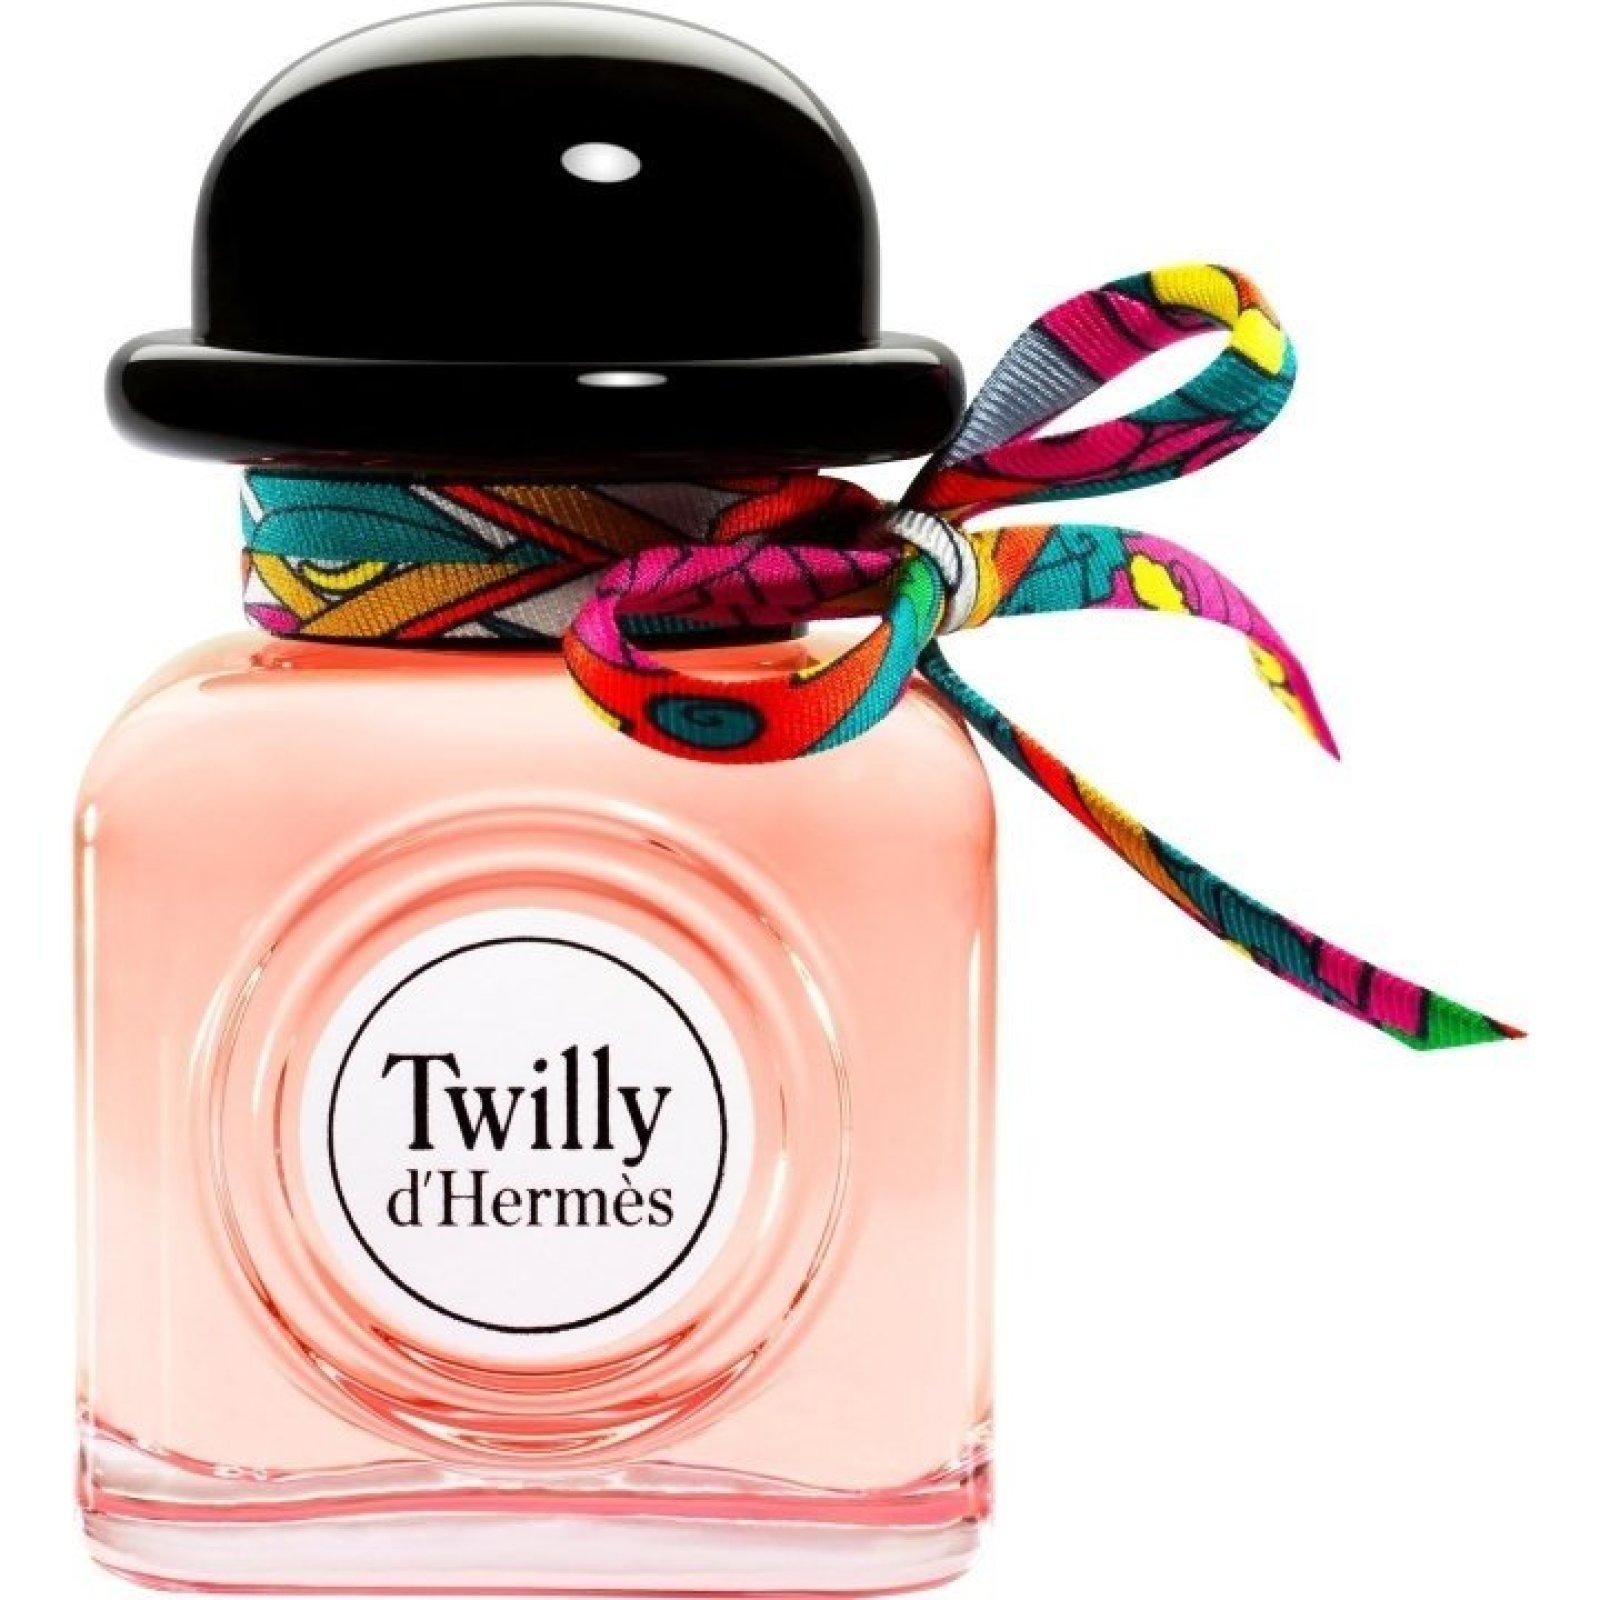 Hermès Twilly d'Hermès